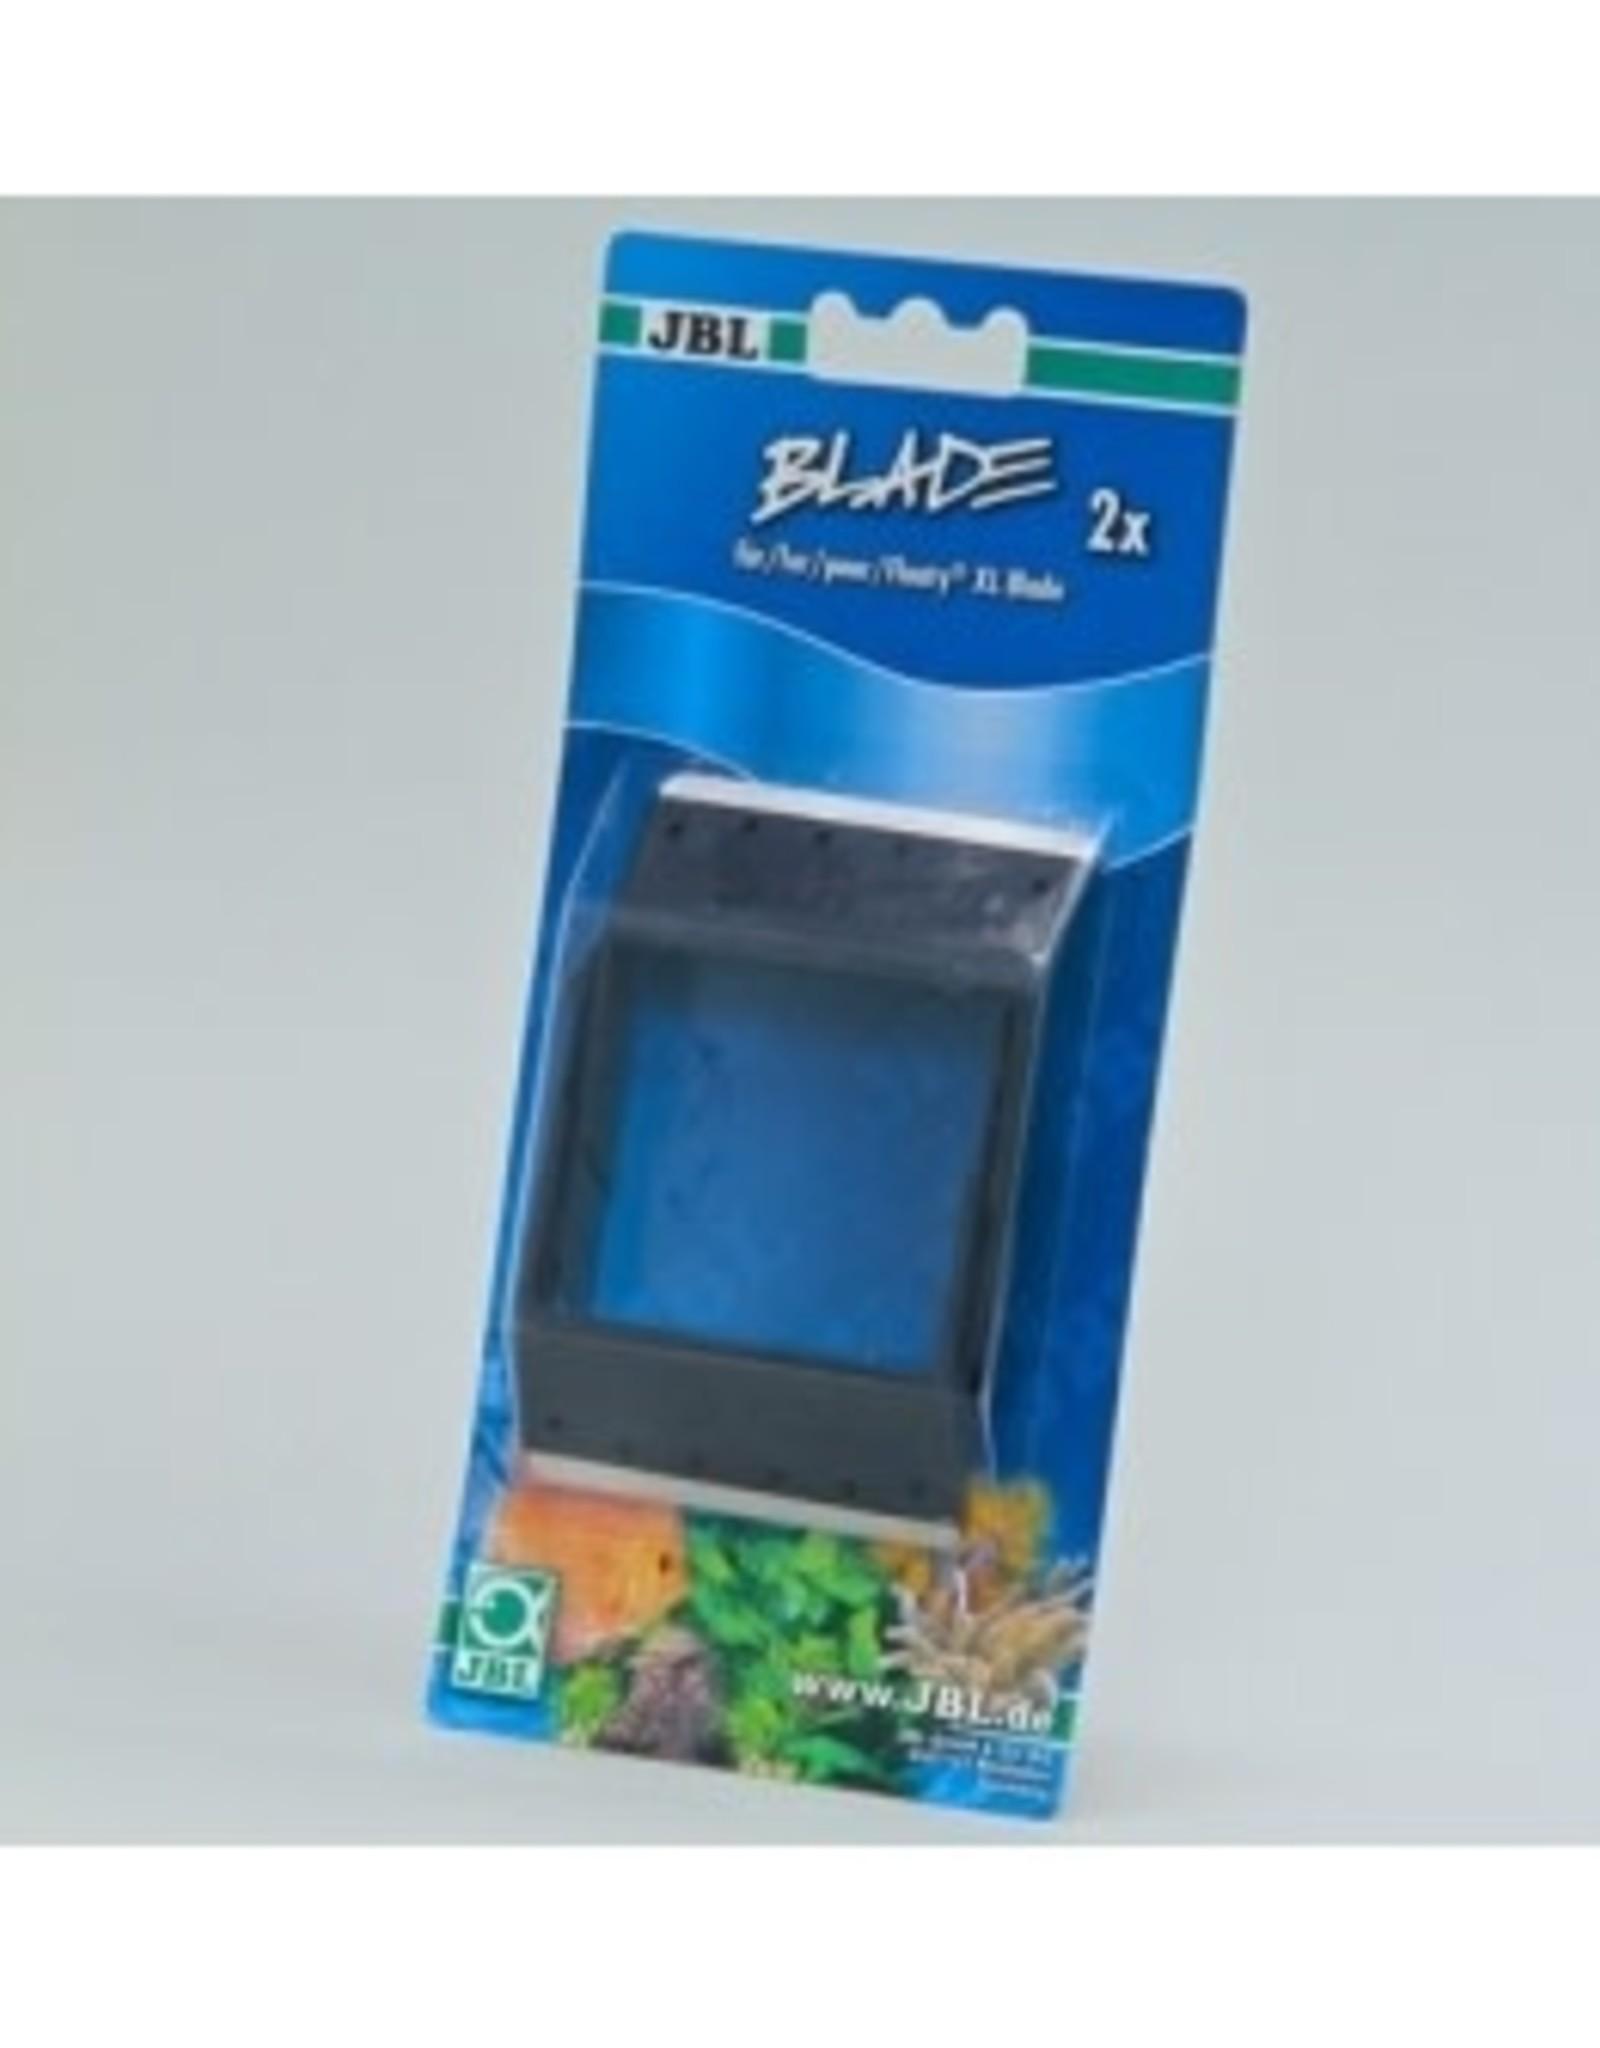 JBL Aimant Floaty Blade - Lames de rechange L/XL 2p